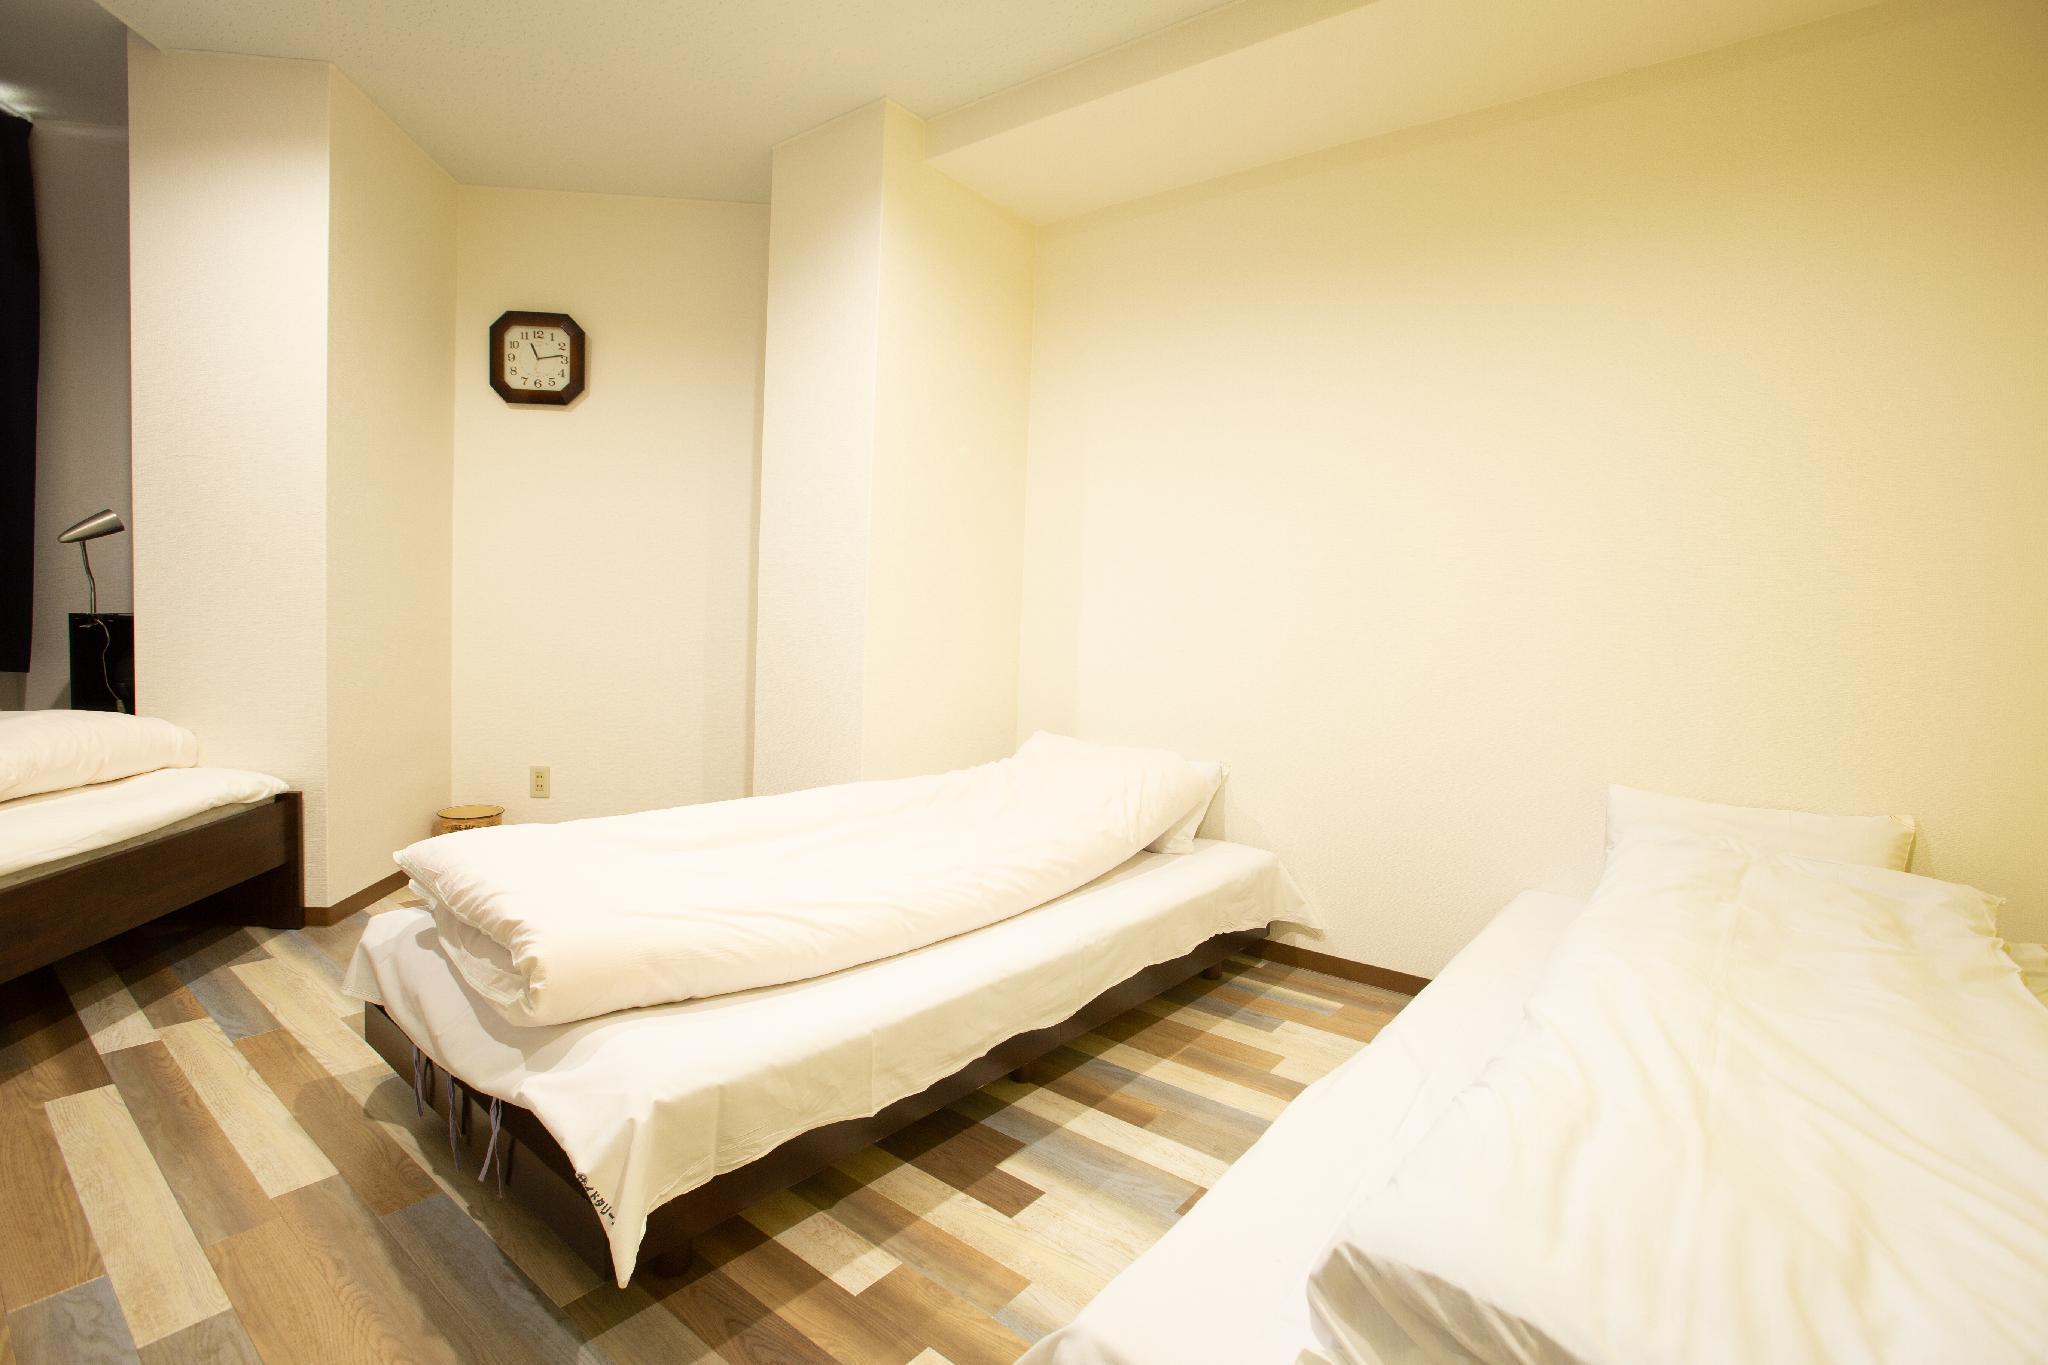 1.2.3 Guest House, Osaka